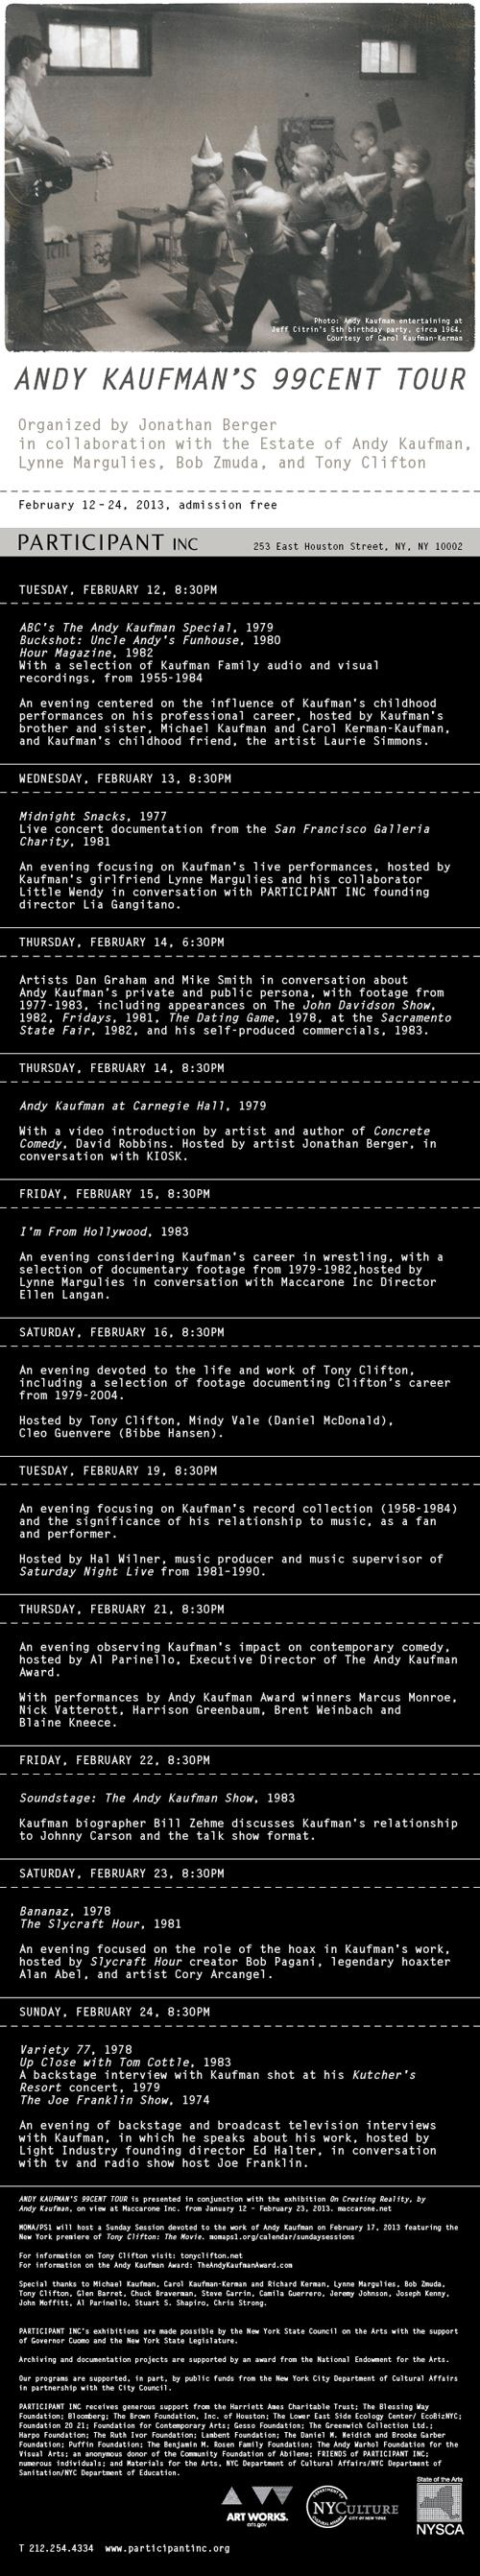 Andy Kaufman's 99cent Tour  | Events Calendar